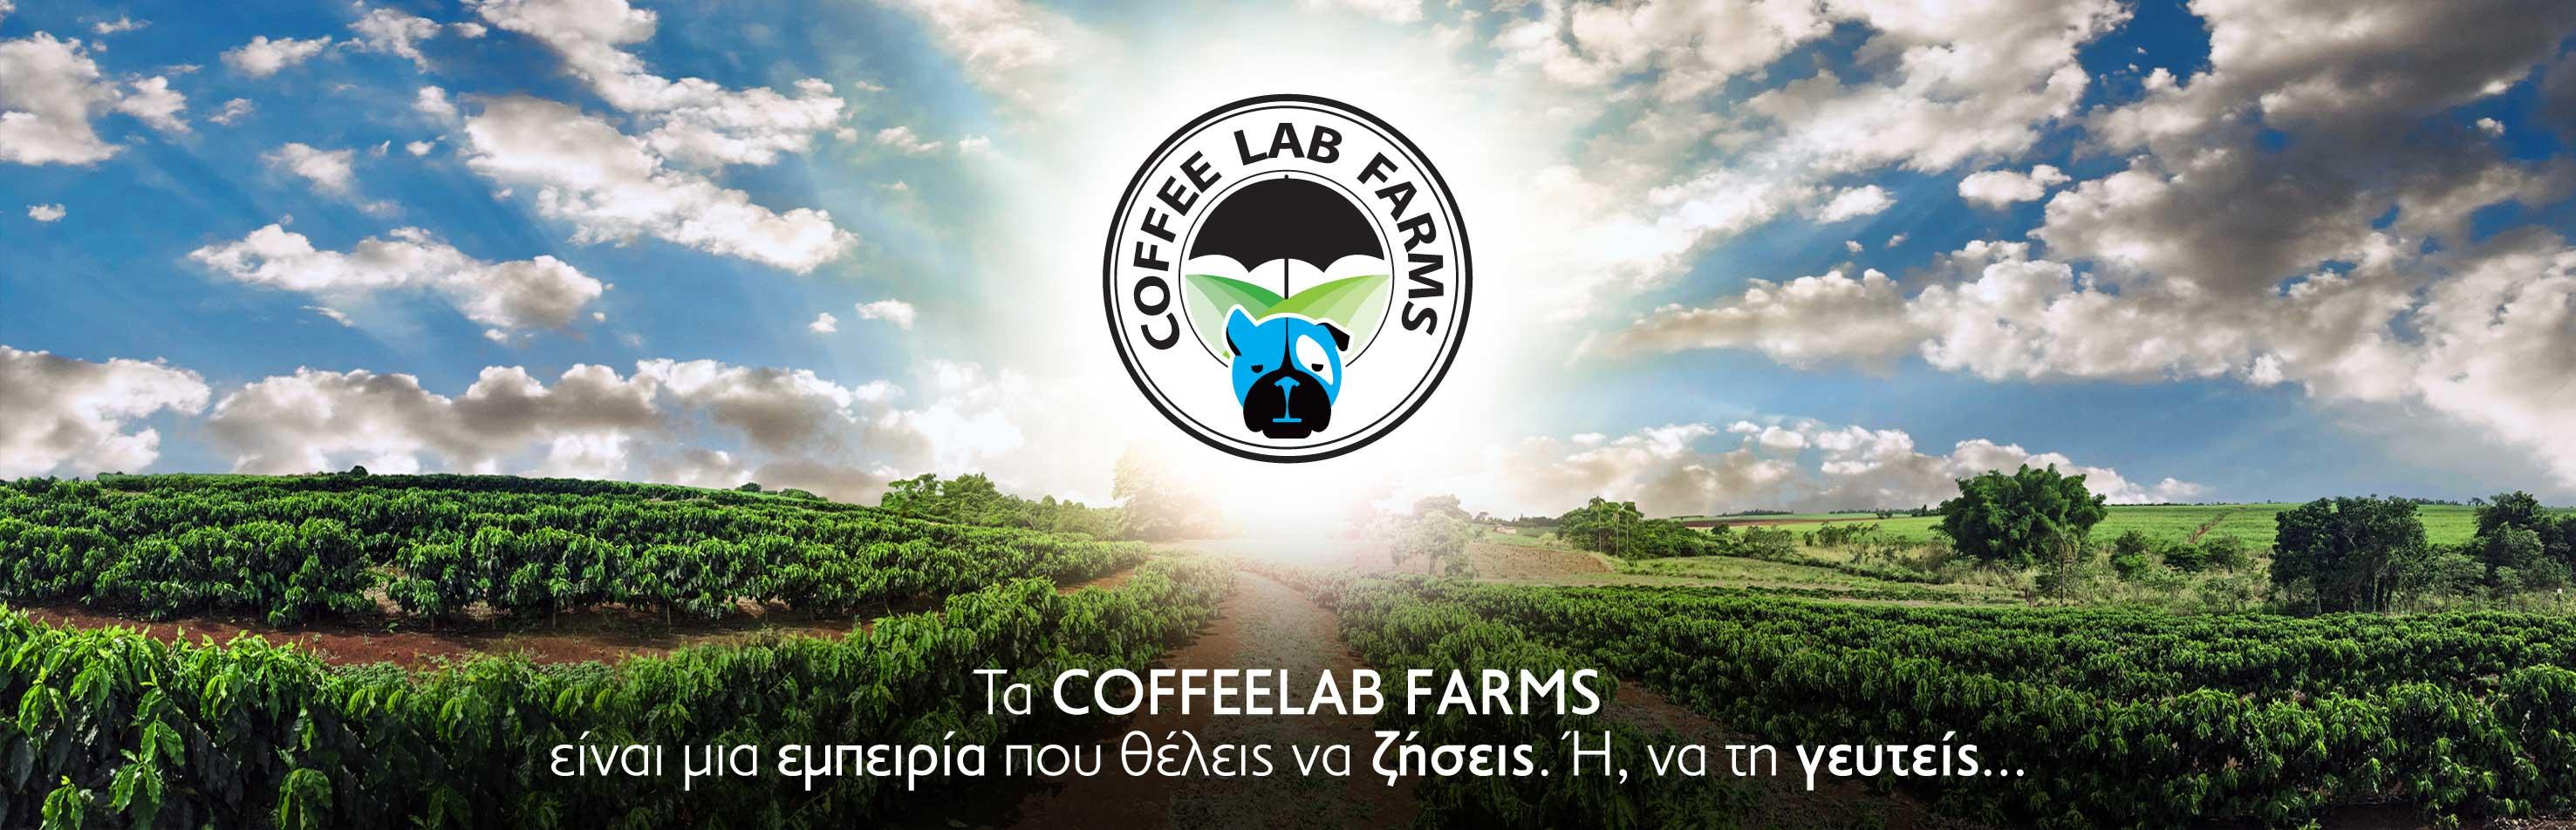 coffeelab farms